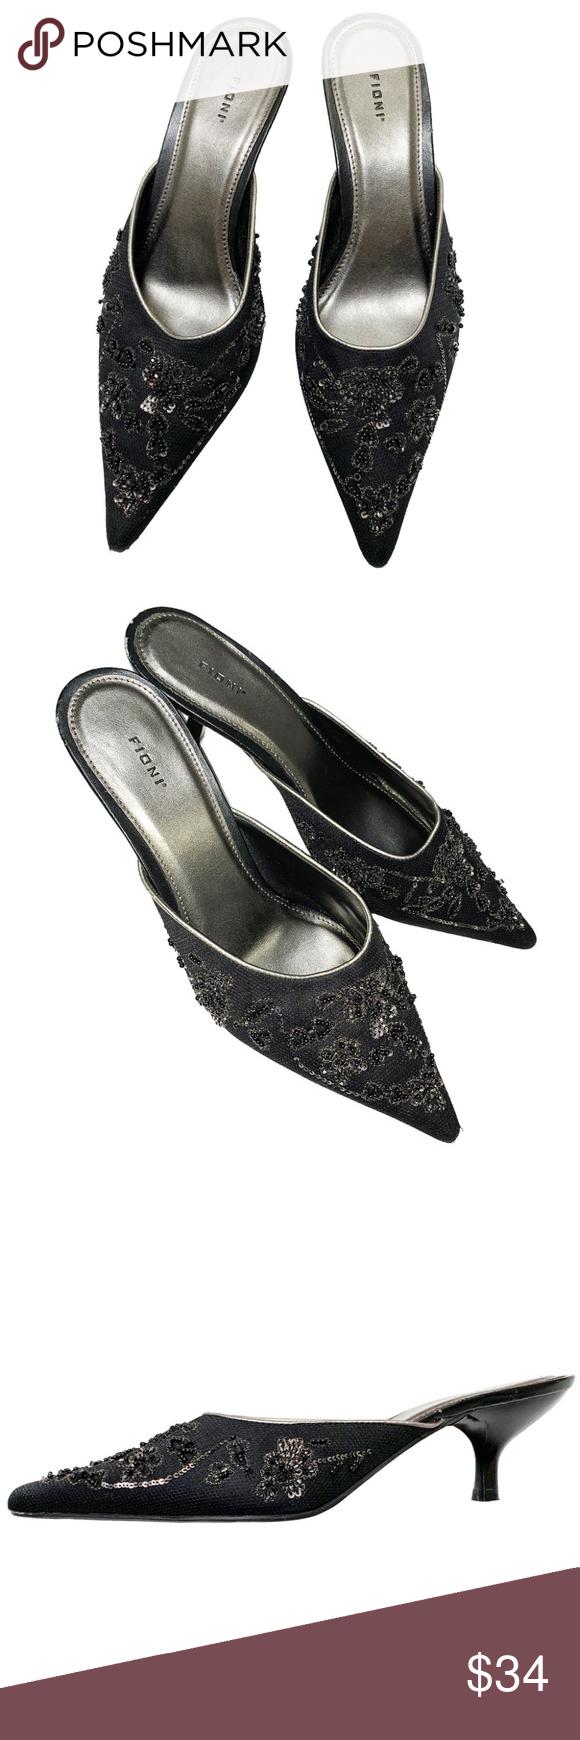 Fioni Elegant Kitten Heel Pointy Toe Mules Size 10 Kitten Heels Pointy Toe Shoes Heels